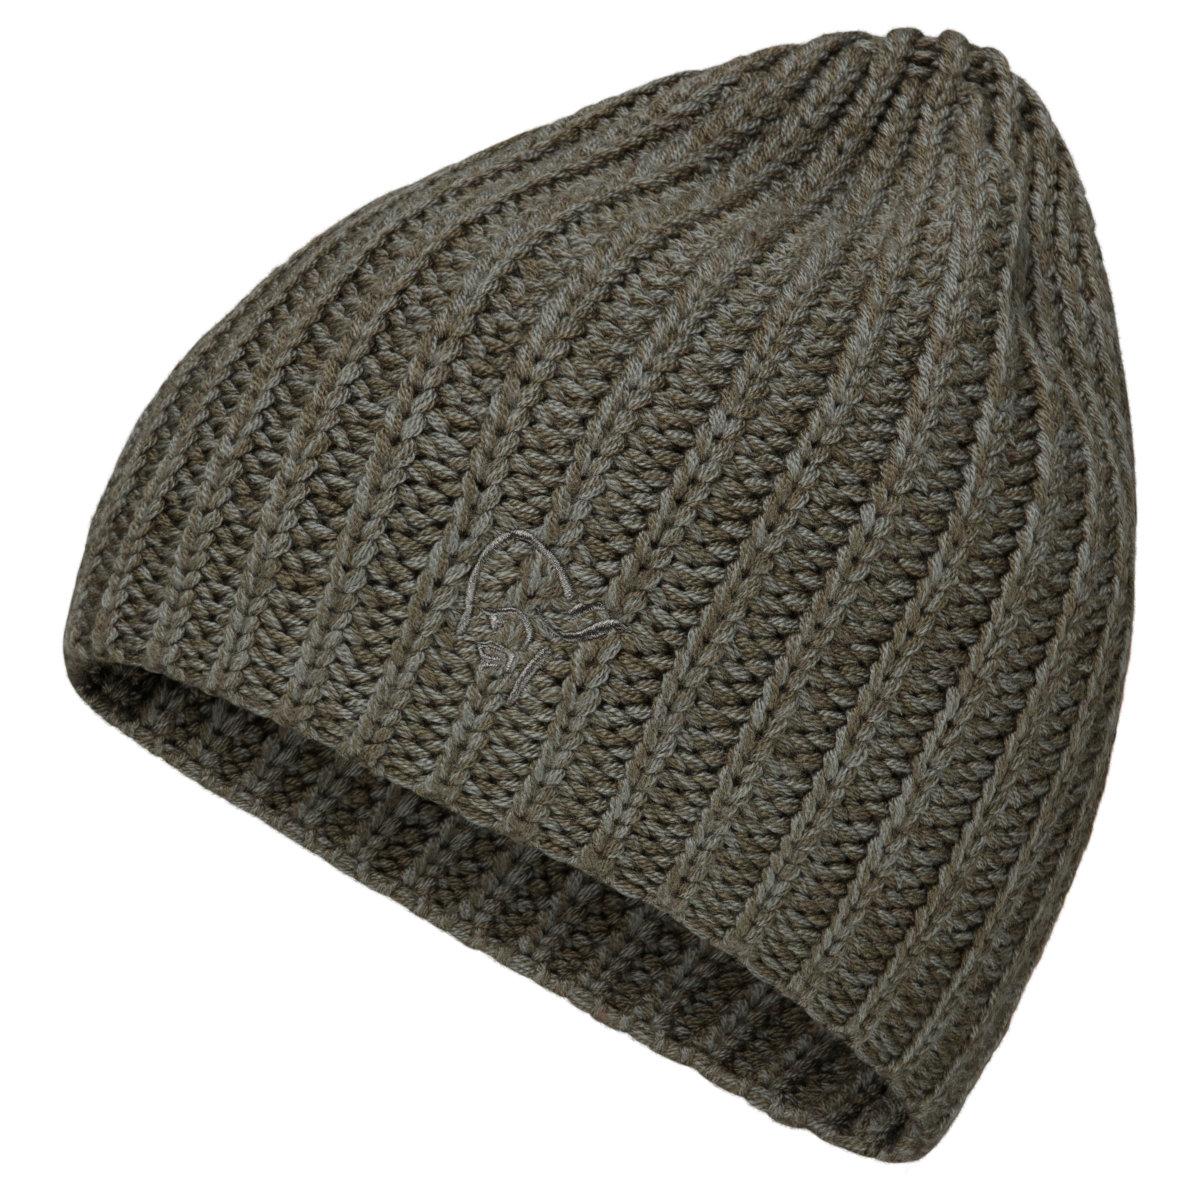 Norrona /29 chunky marl knit Beanie - Castor Grey